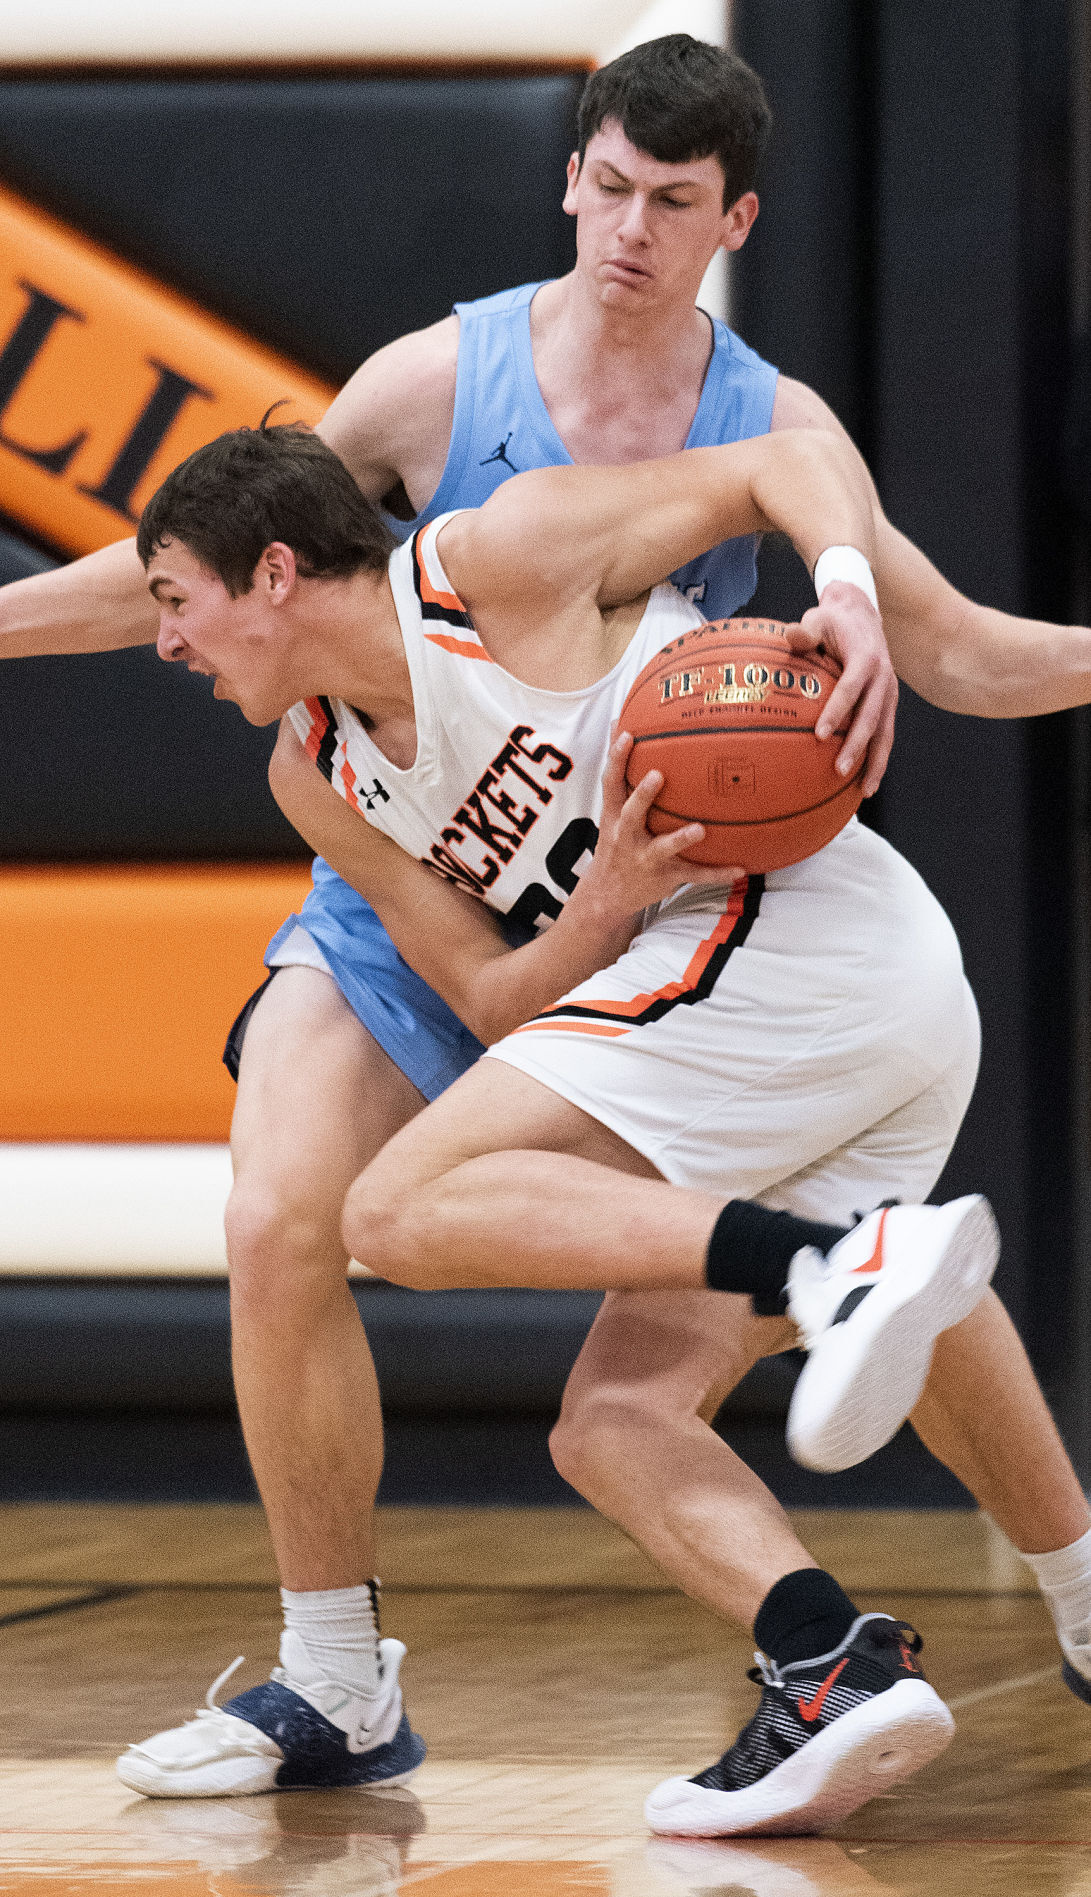 Rock Valley vs Unity Christian basketball